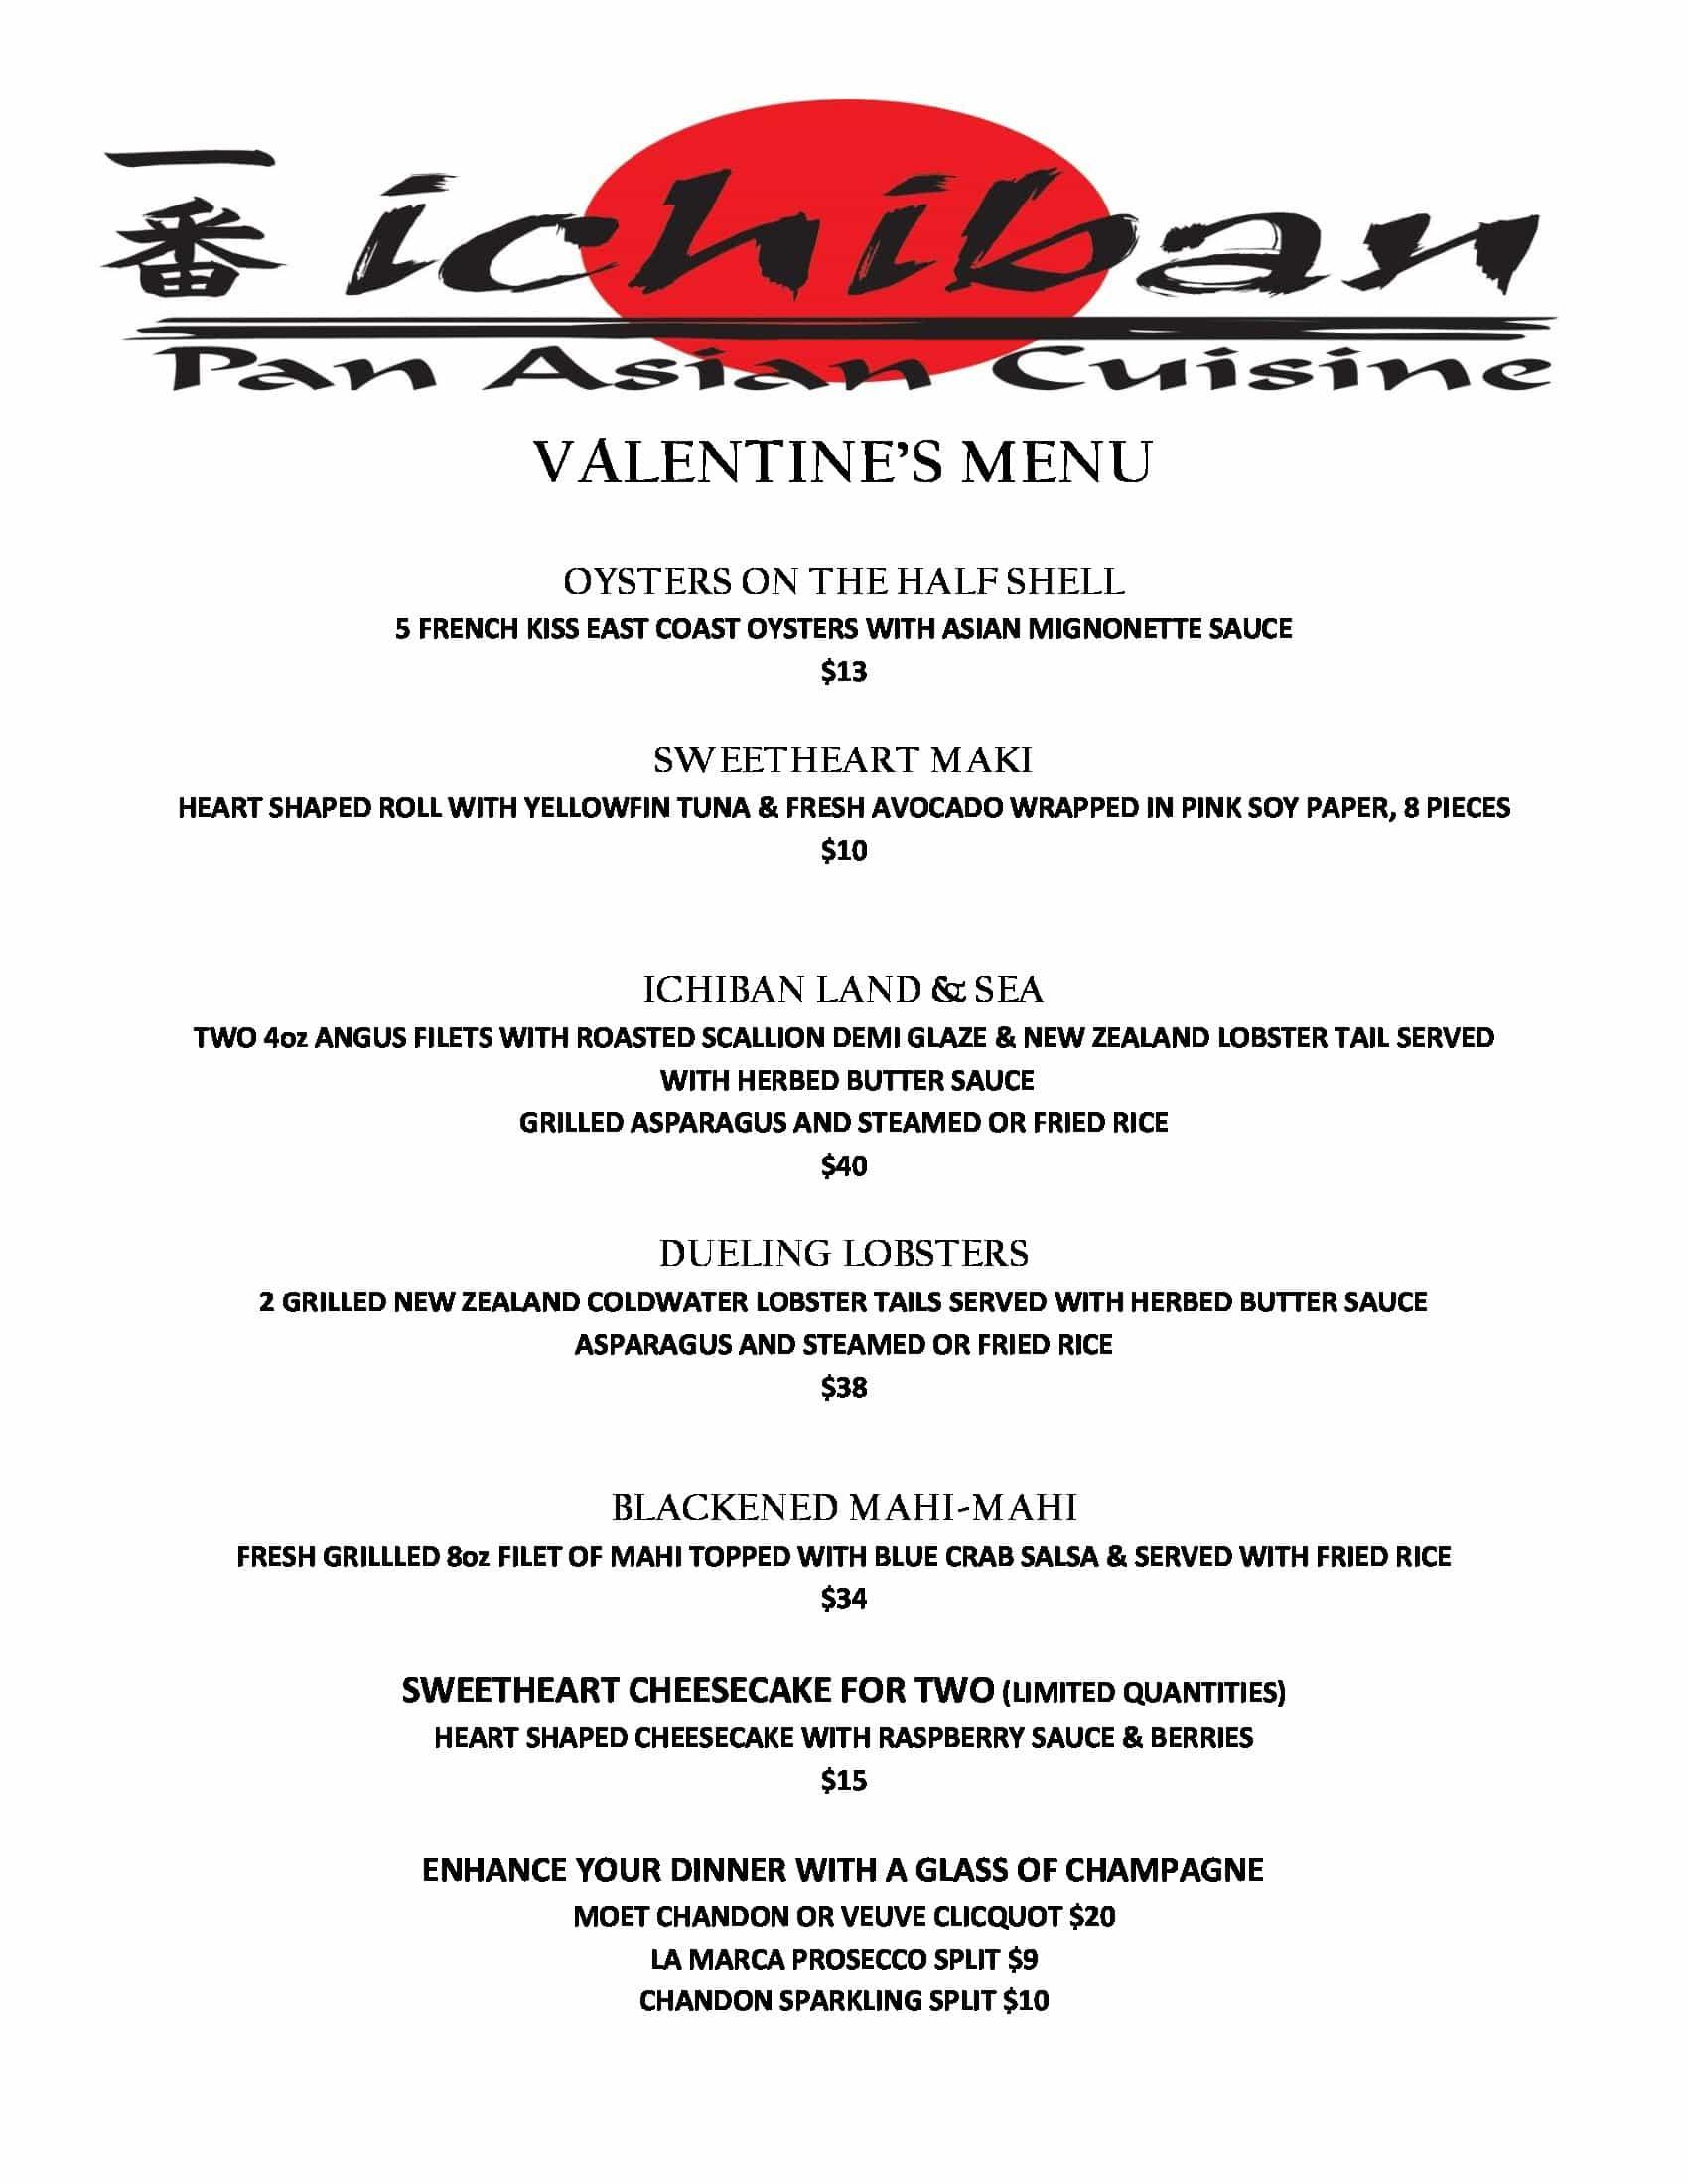 VALENTINE 2017 DINNER MENU